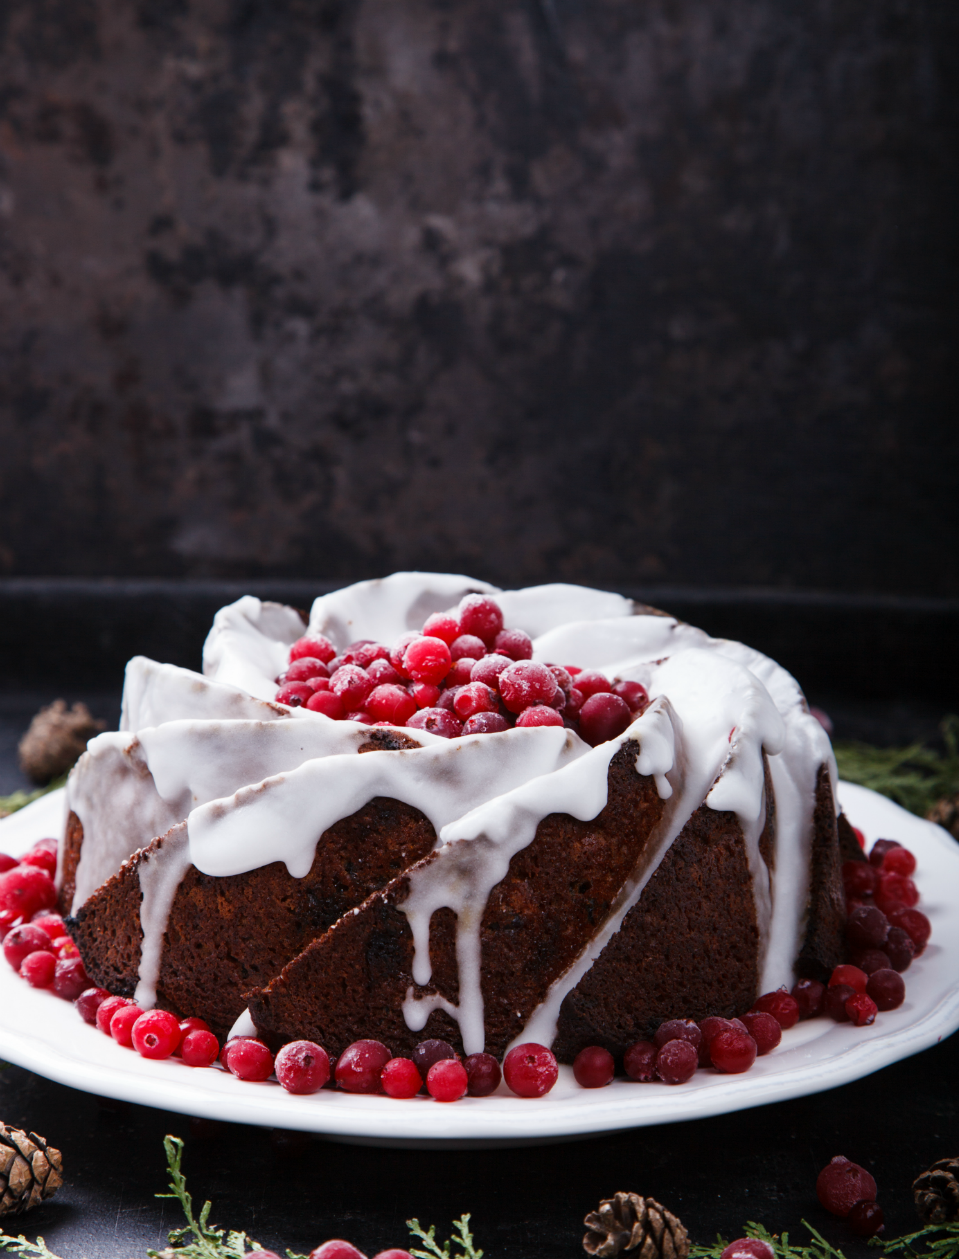 Sugar free chocolate christmas pound cake recipe sugar free blog sugar free chocolate christmas pound cake recipe forumfinder Image collections